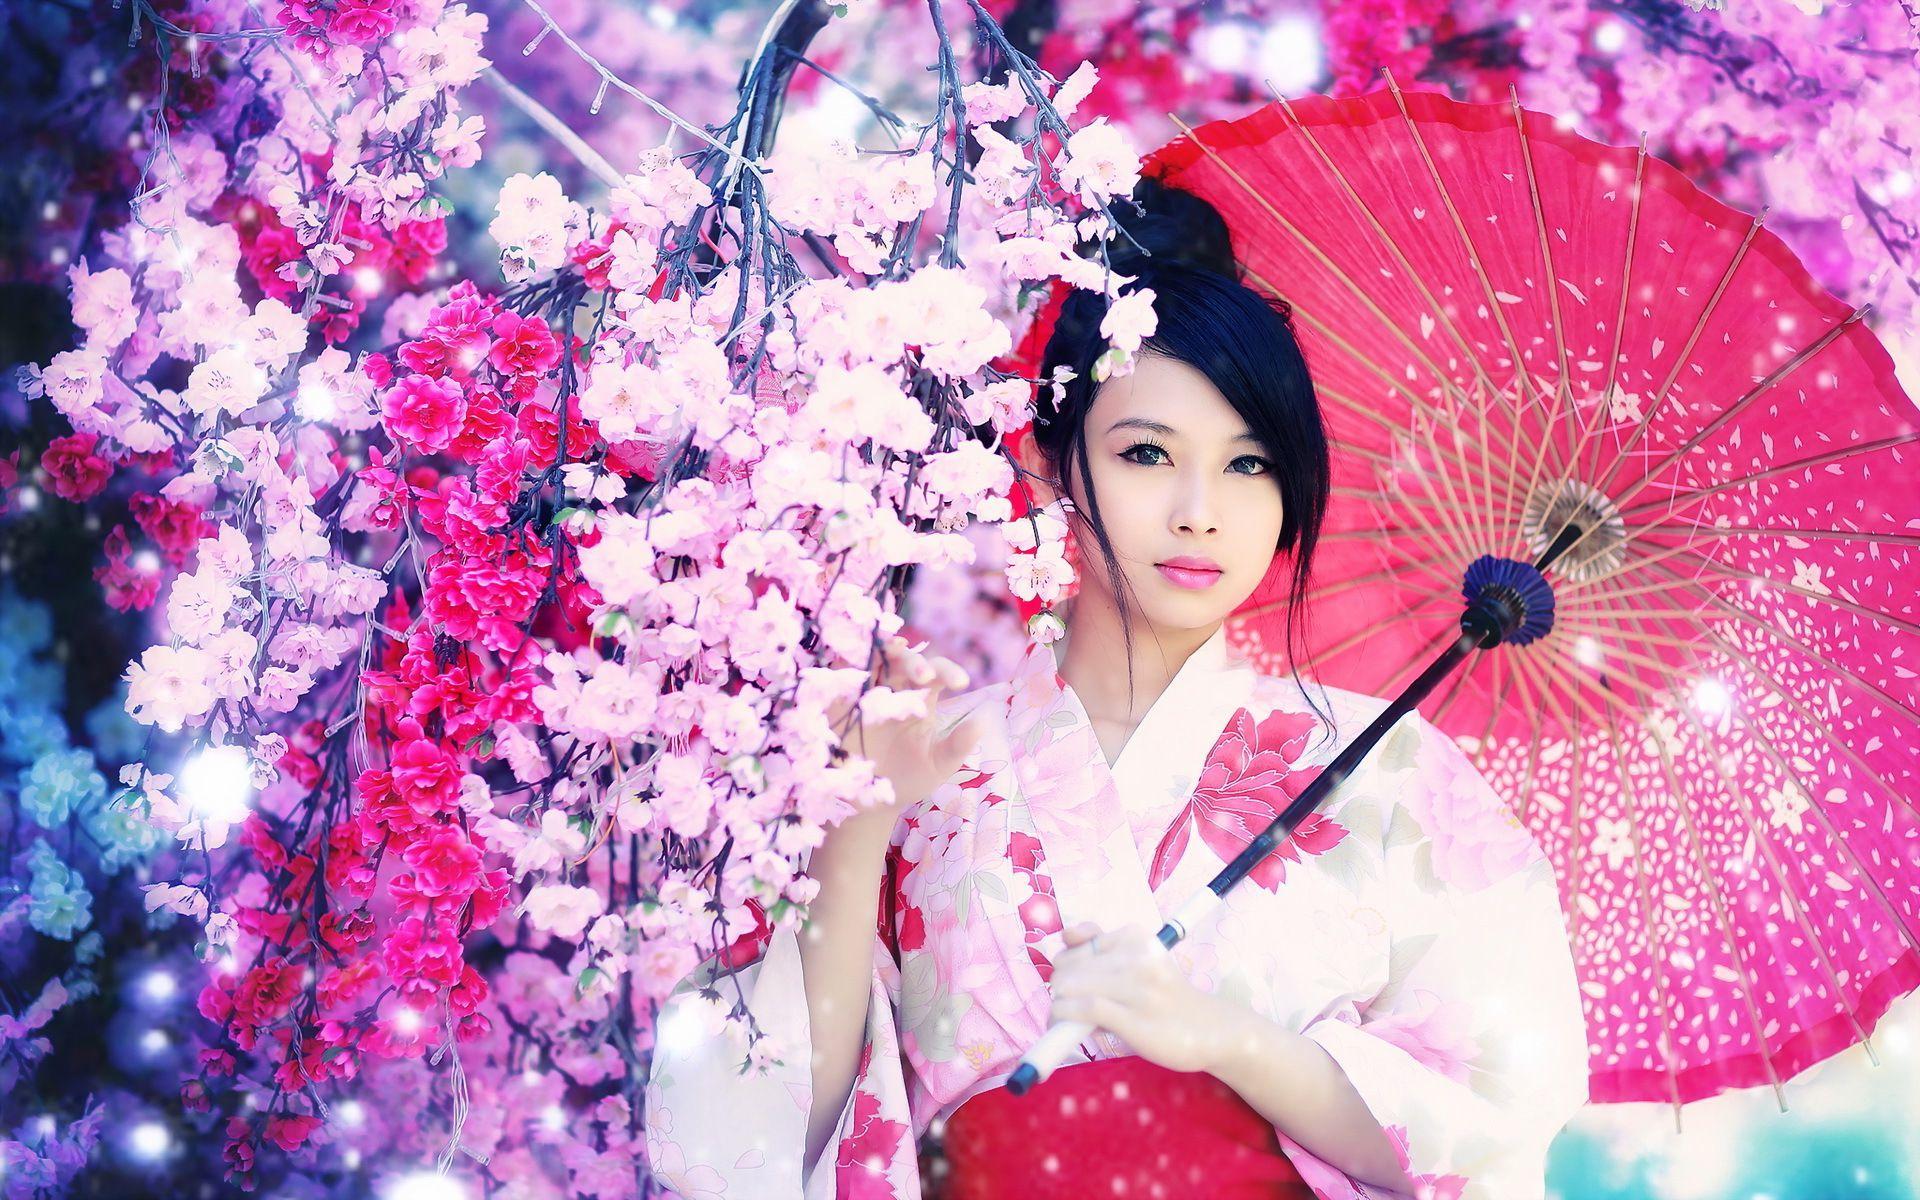 wallpaper geisha corals girl - photo #26